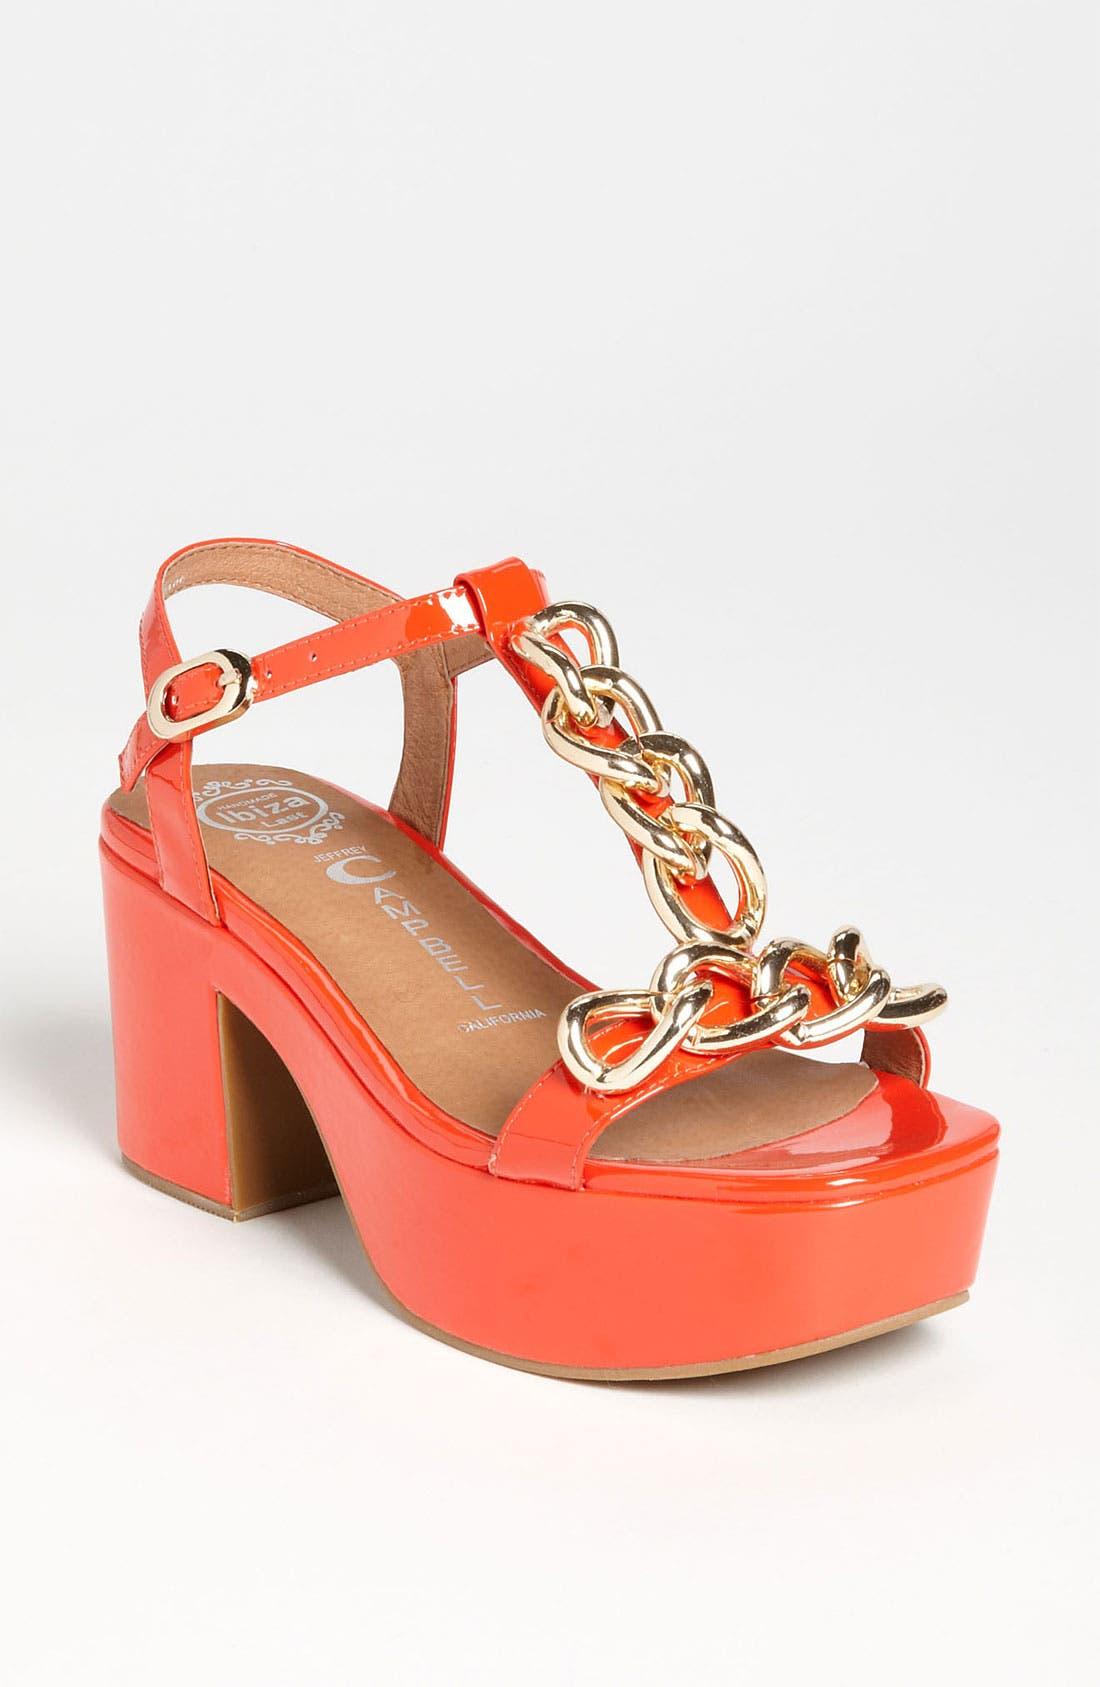 Alternate Image 1 Selected - Jeffrey Campbell 'Yasmine' Sandal